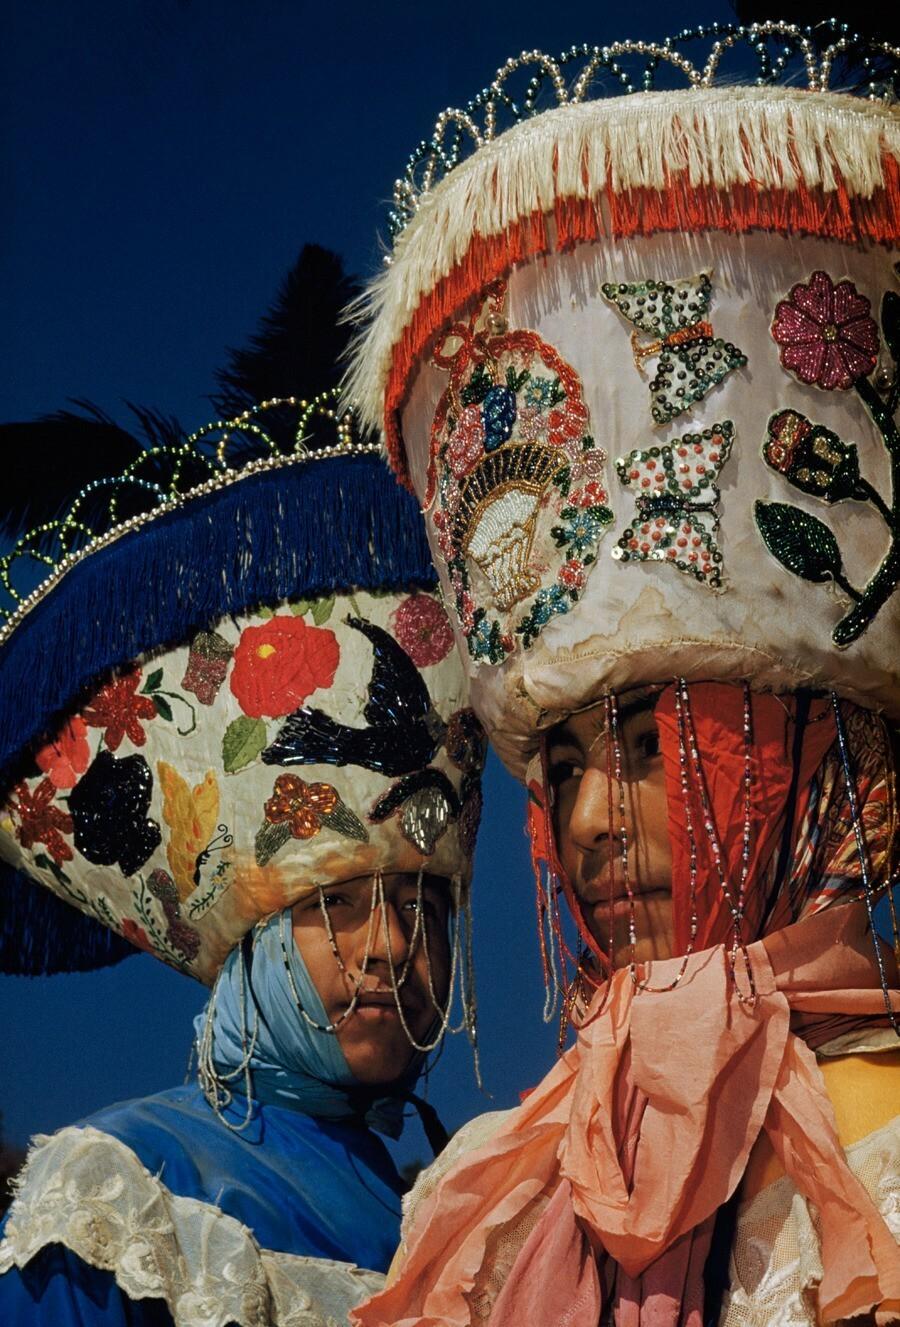 Карнавал в городе Тепоцотлан, Мексика, 1951. Фотограф Джастин Лок